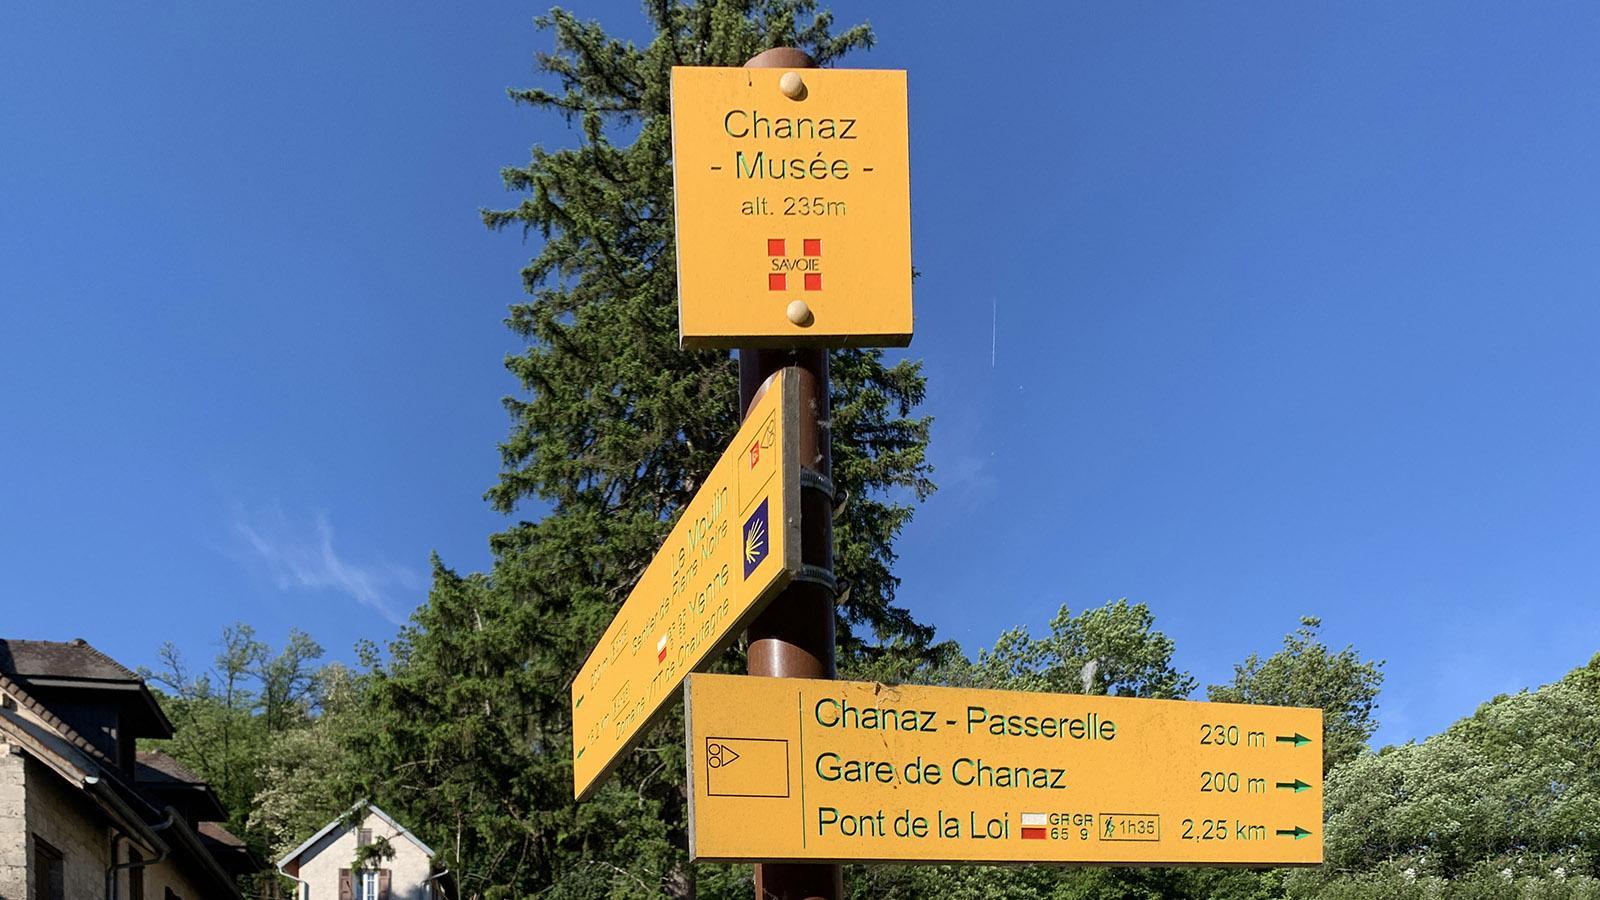 Der Jakobsweg berührt Chanaz ebenso wie der Weitwanderweg GR 65. Foto: Hilke Maunder